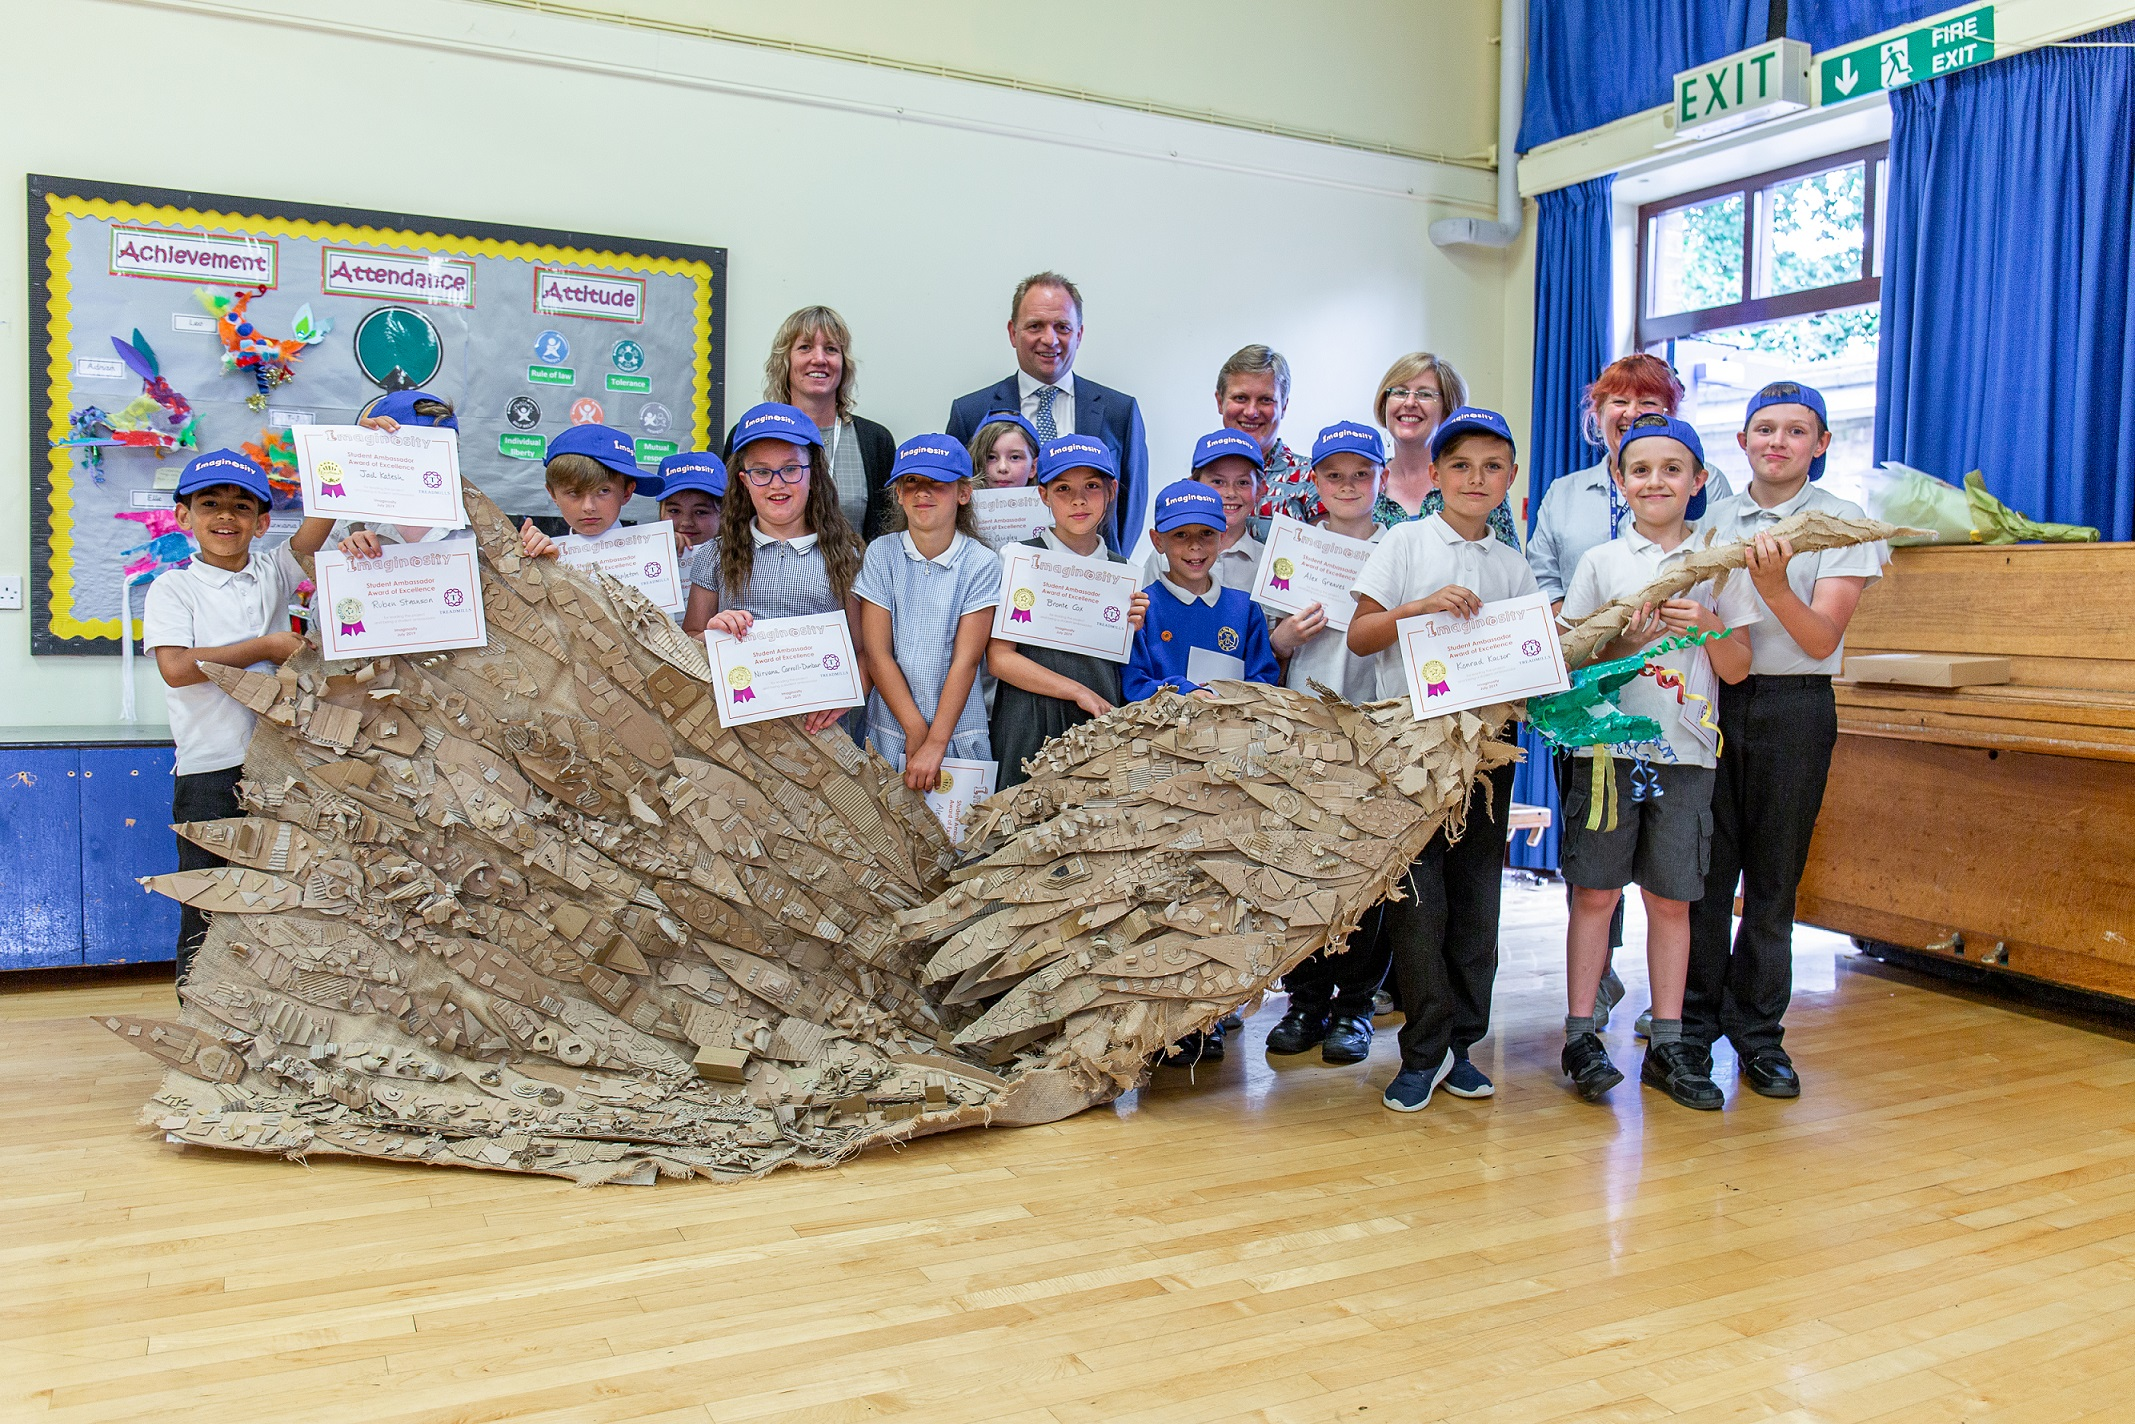 CHILDREN CELEBRATE SCHOOL ARTS PROJECT SUCCESS